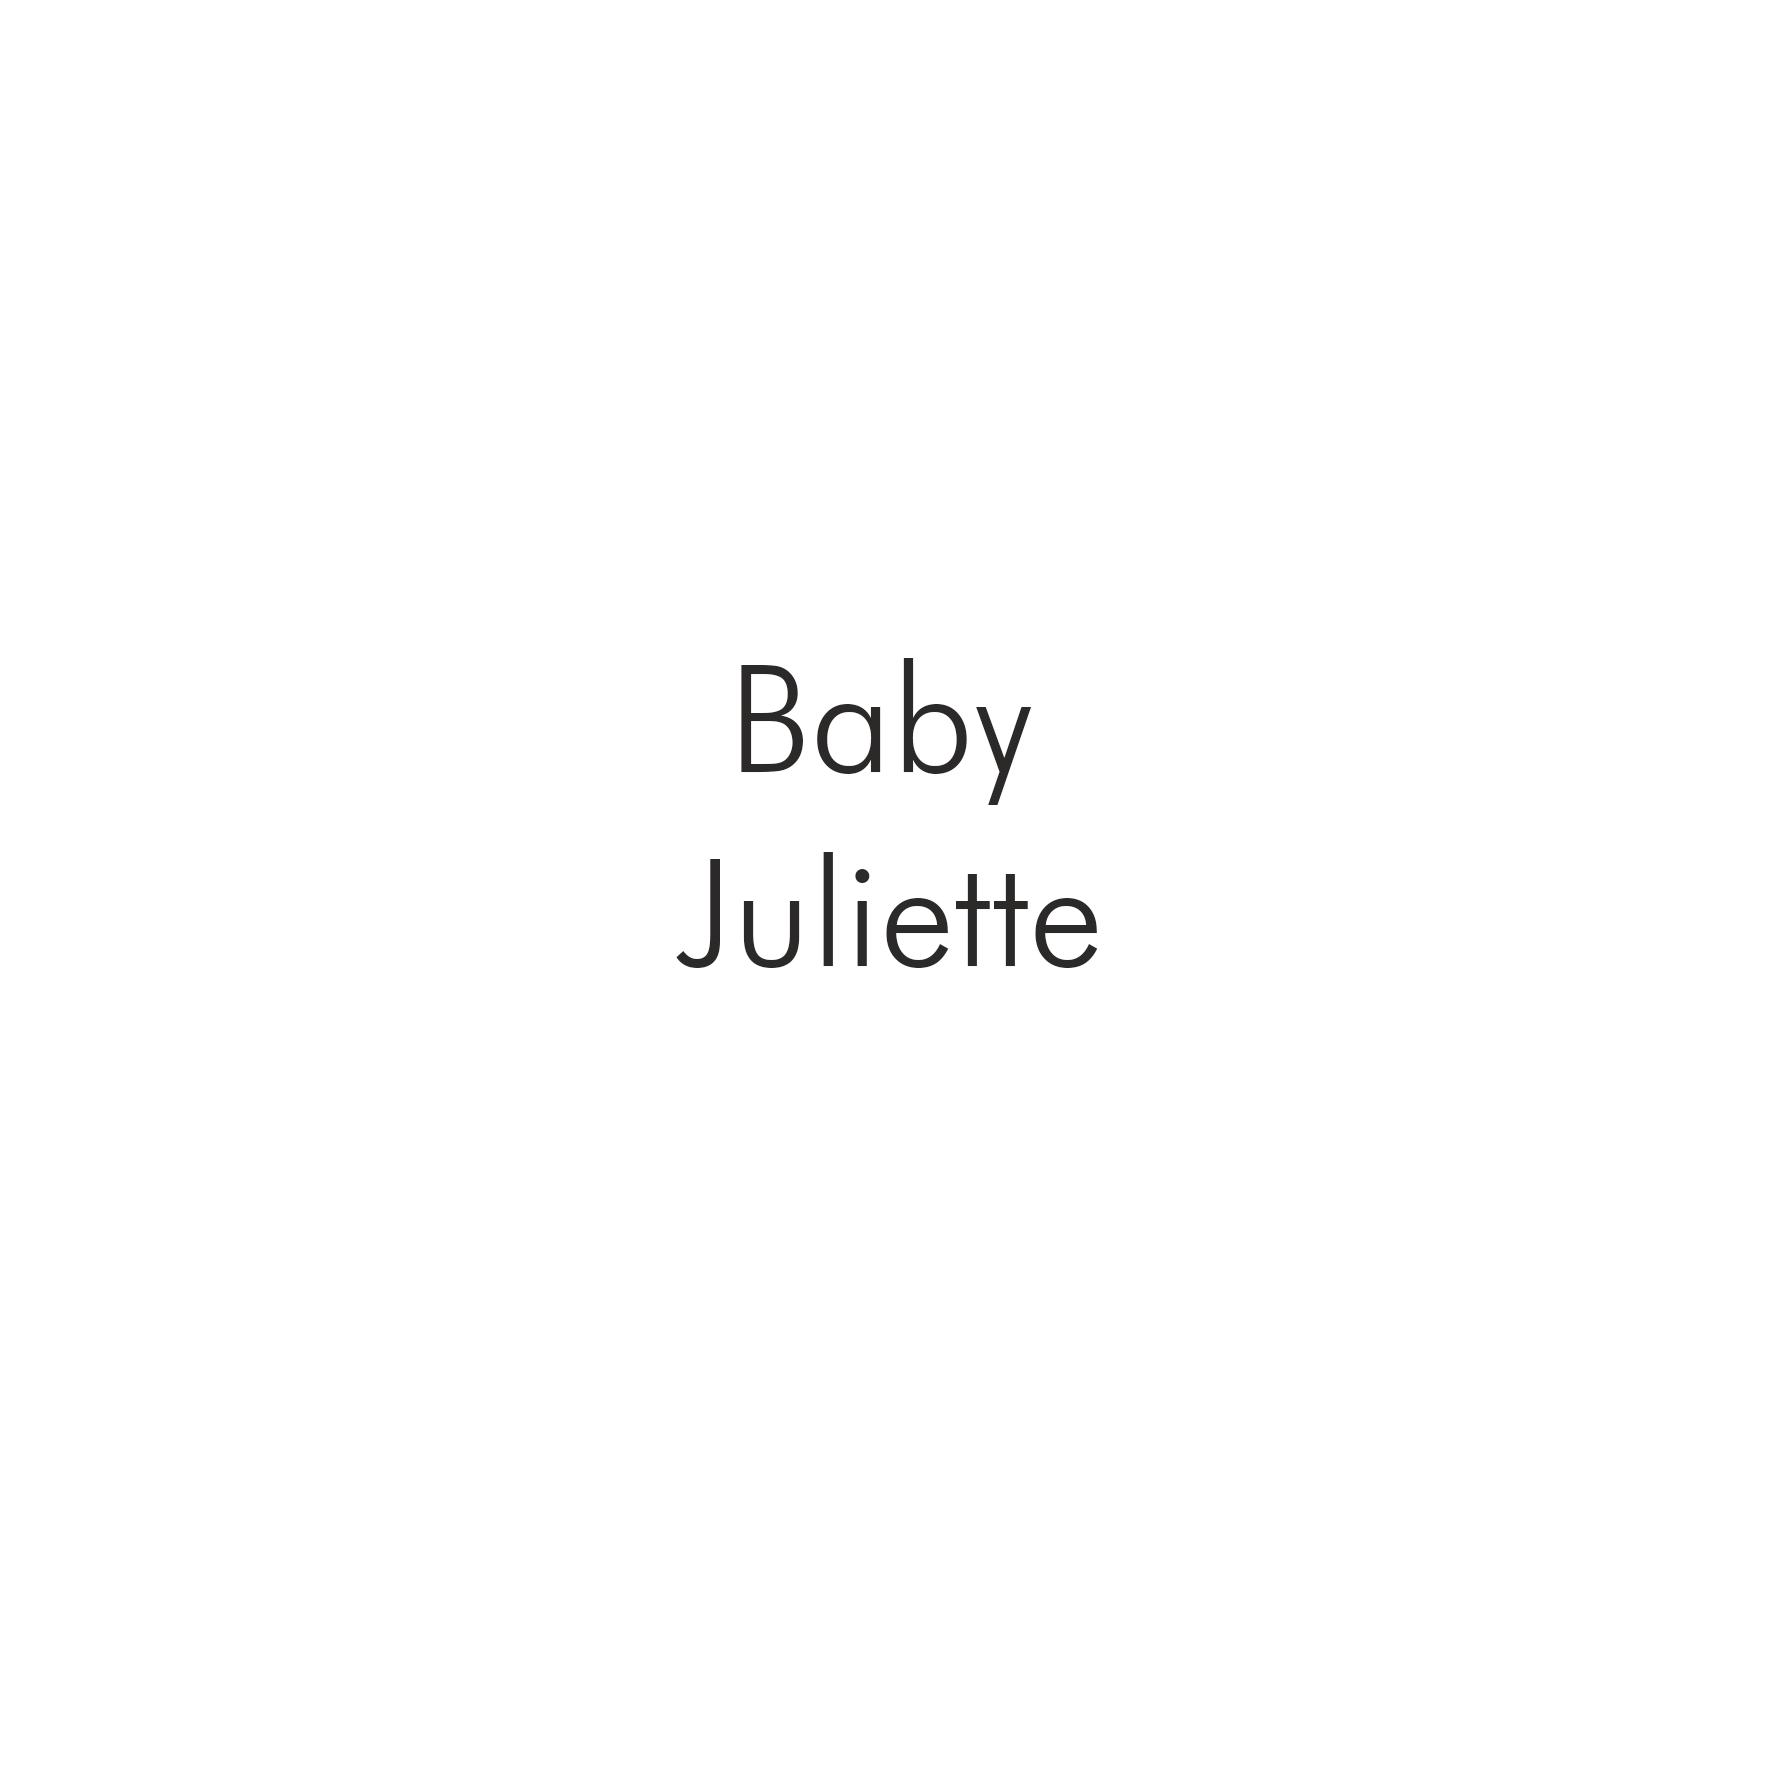 Baby Juliette.png